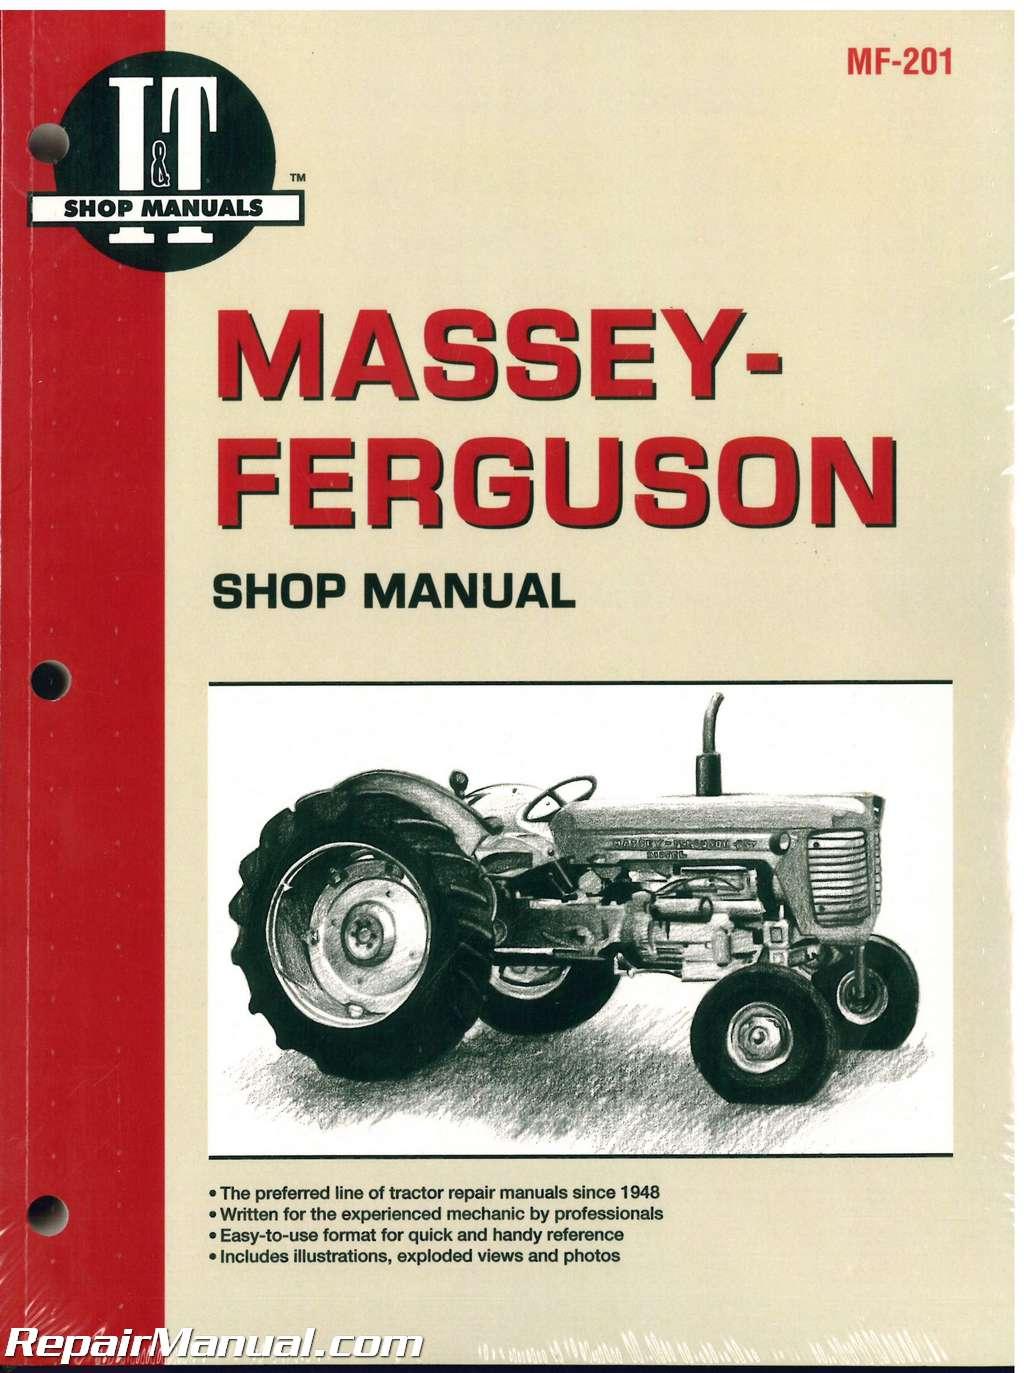 Massey Ferguson Mf65 85 88 Super 90 90wr 1100 1130 1150 1105 1135 1155 1080 1085 Tractor Shop Manual